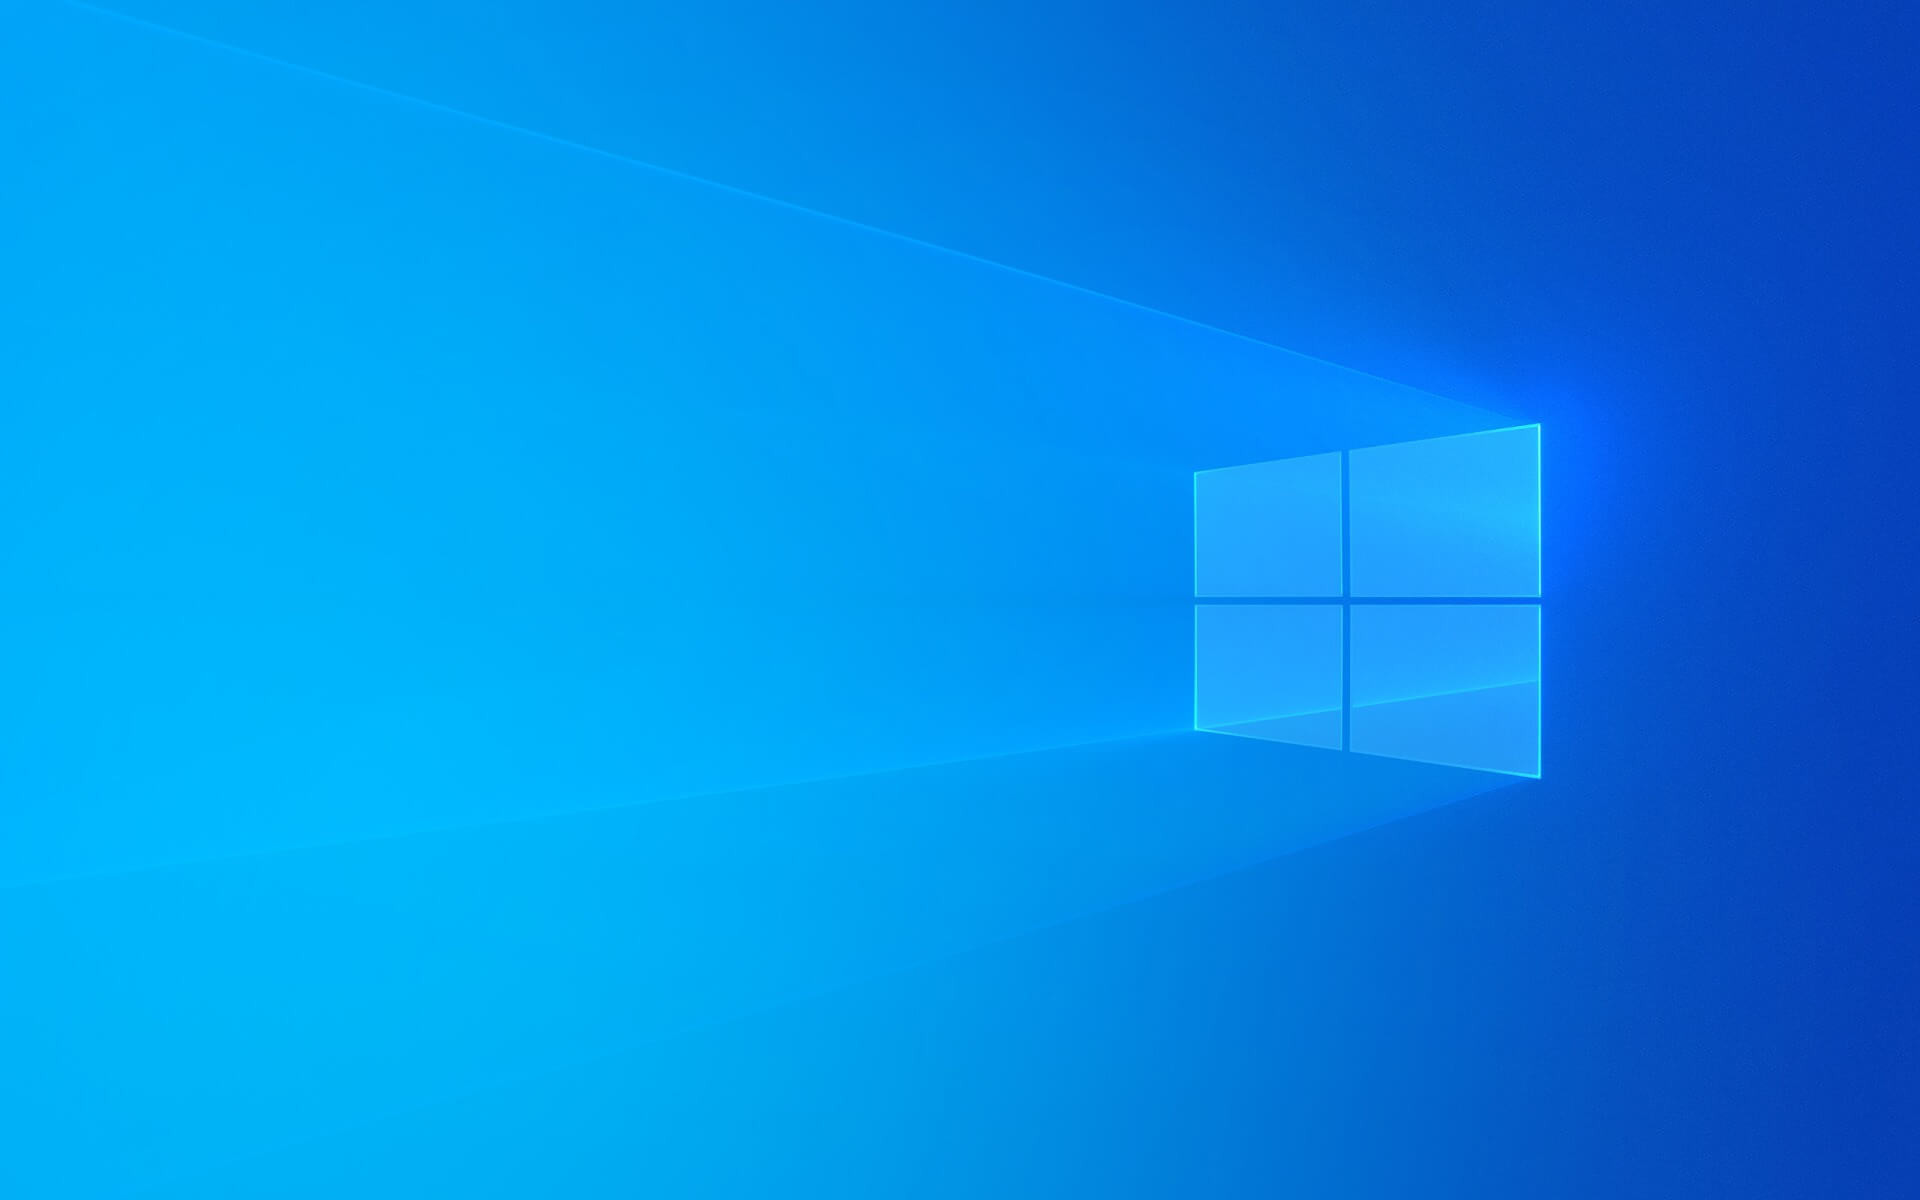 1324771 new windows 10 pro wallpaper